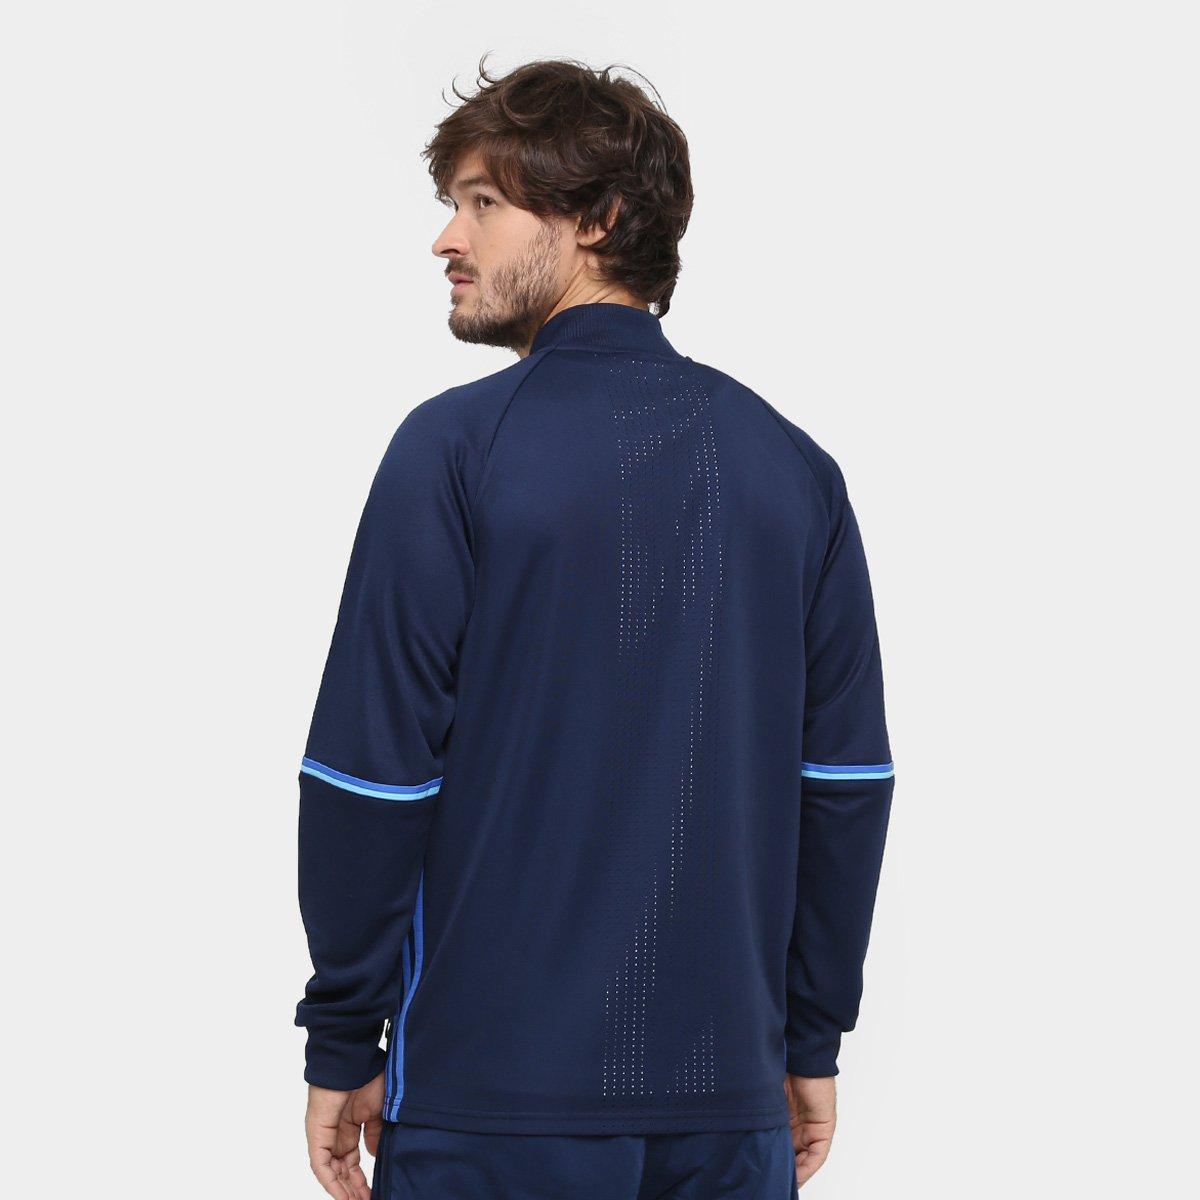 59a2dd93c4 ... Jaqueta Adidas Treino Condivo 16 Masculina - Compre Agora Netshoes  649207b174e160 ...